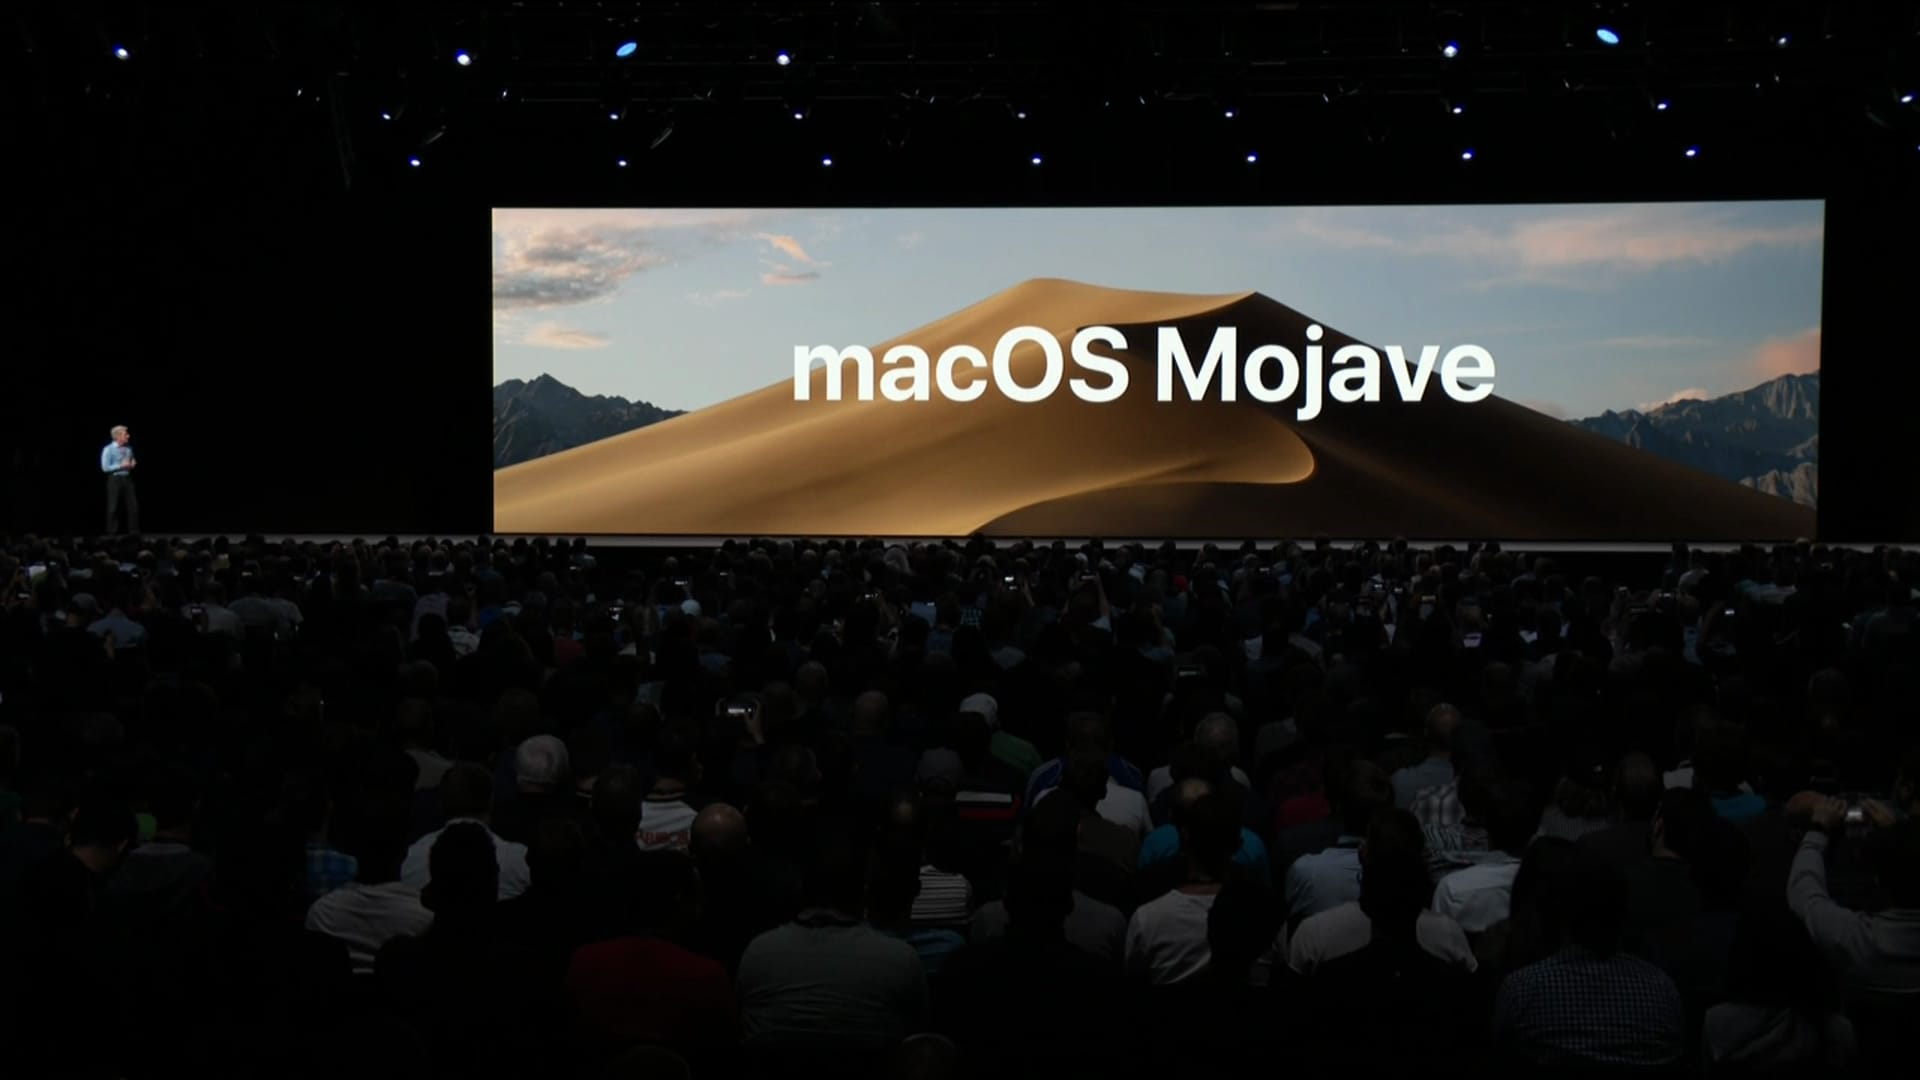 Apple reveals new Mac operating system